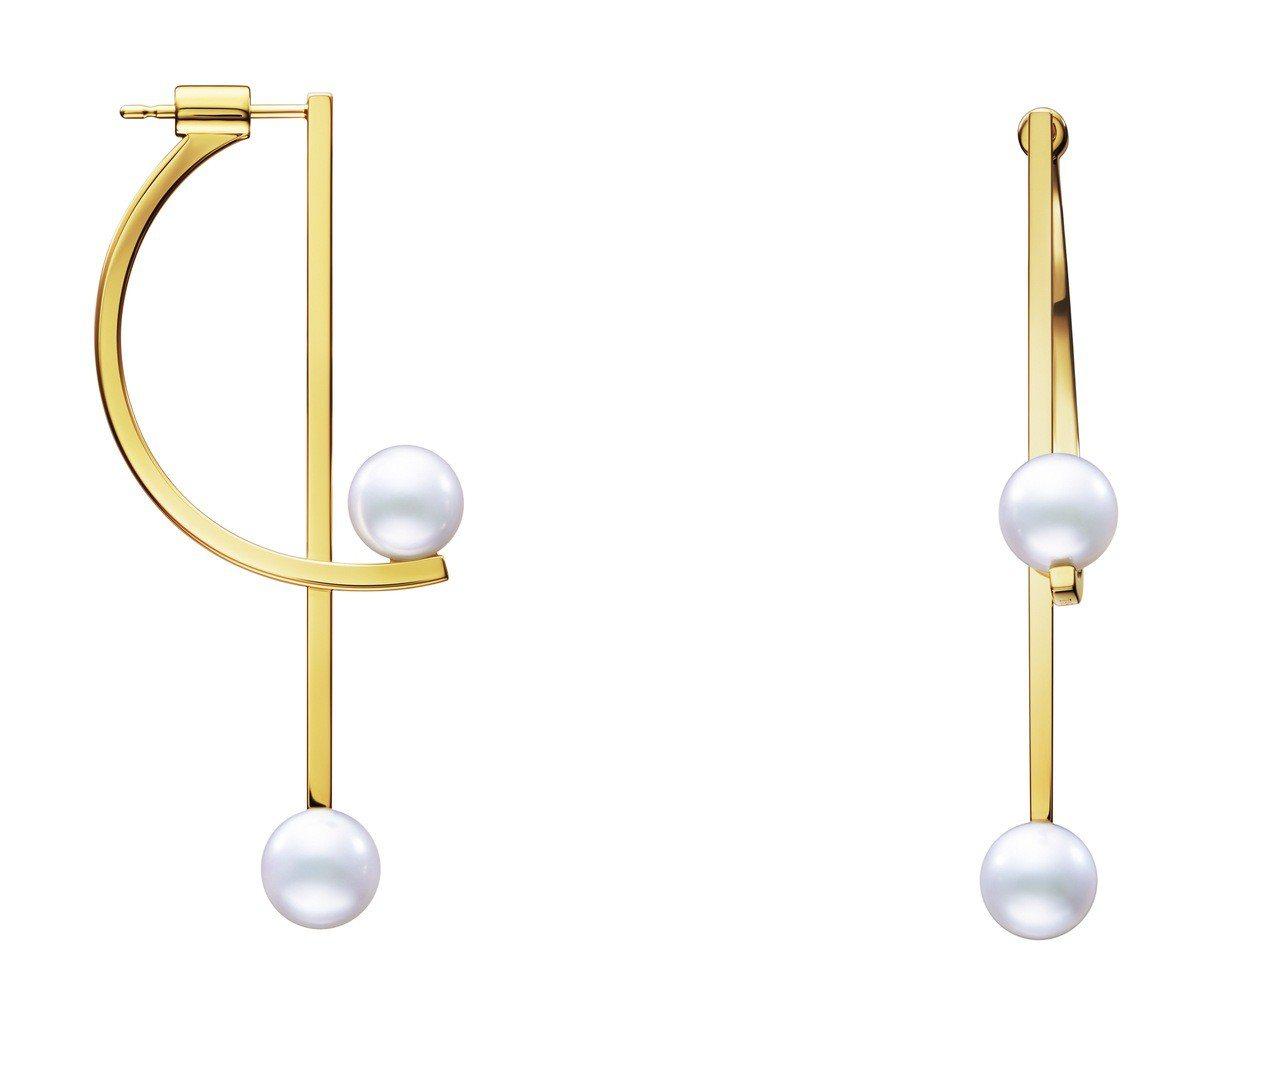 TASAKI kinetic珍珠黃K金耳環,18K黃金與阿古屋珍珠,約12萬8,...